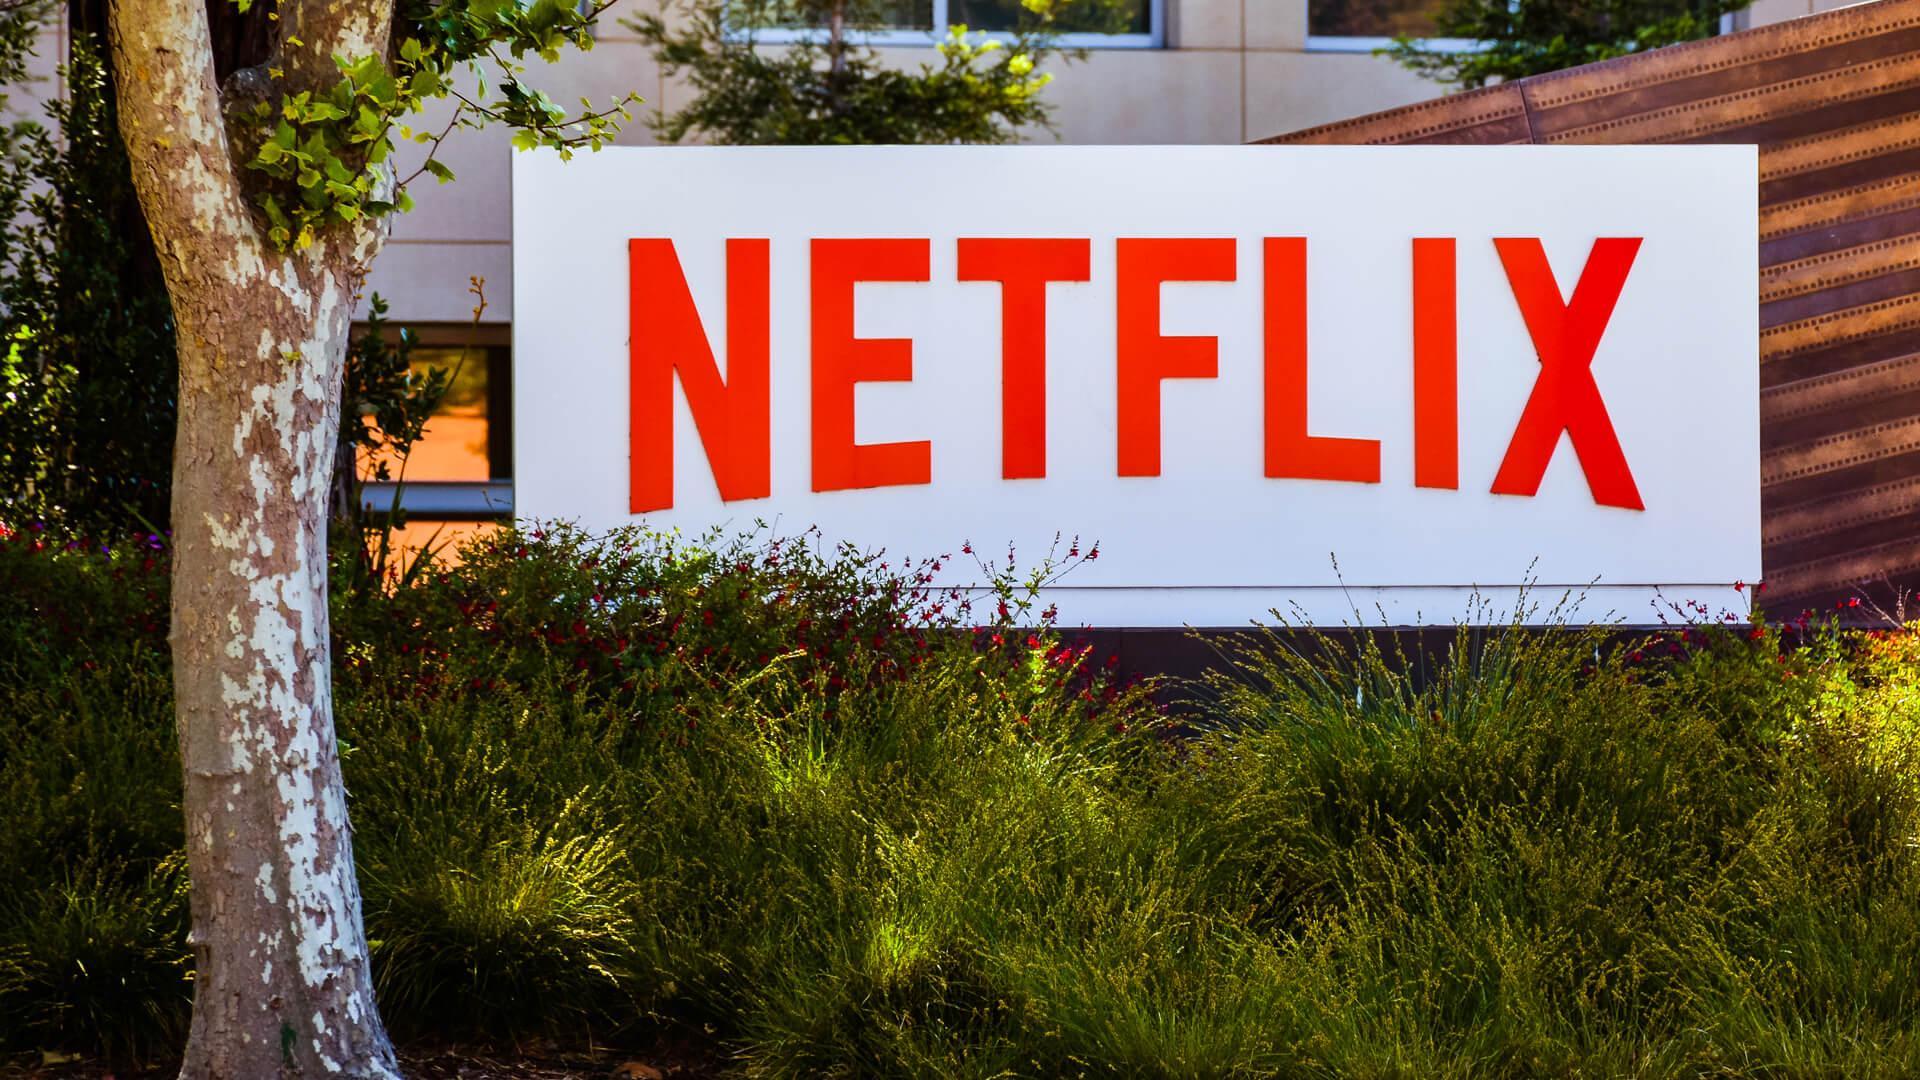 Netflix building sign